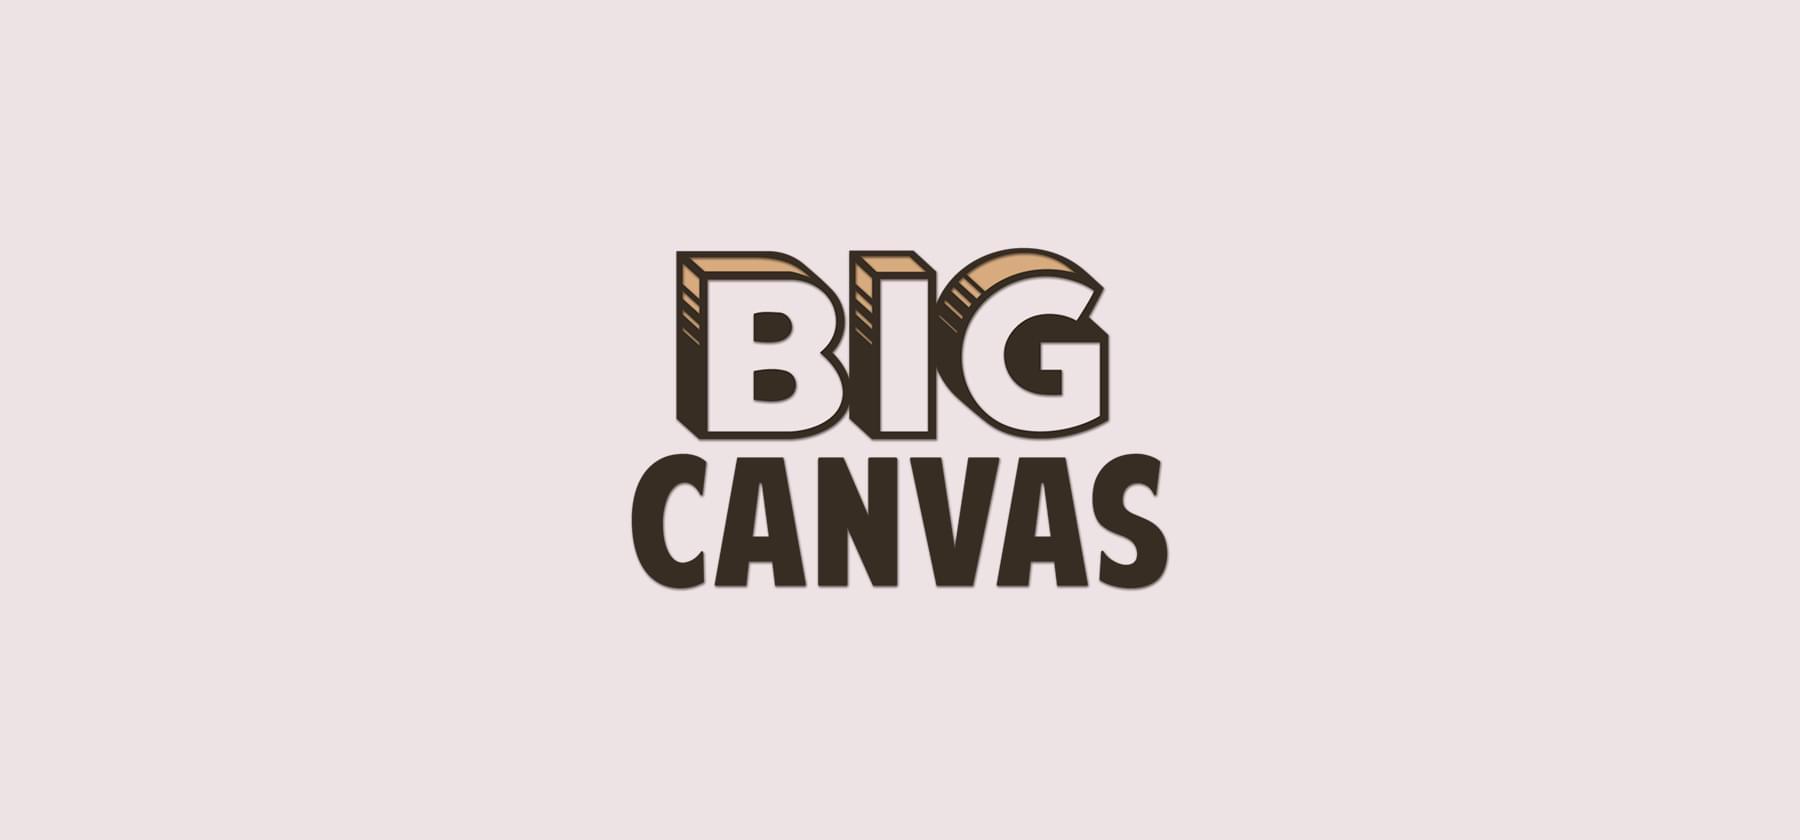 Big Canvas Improv joins Matt in Studio